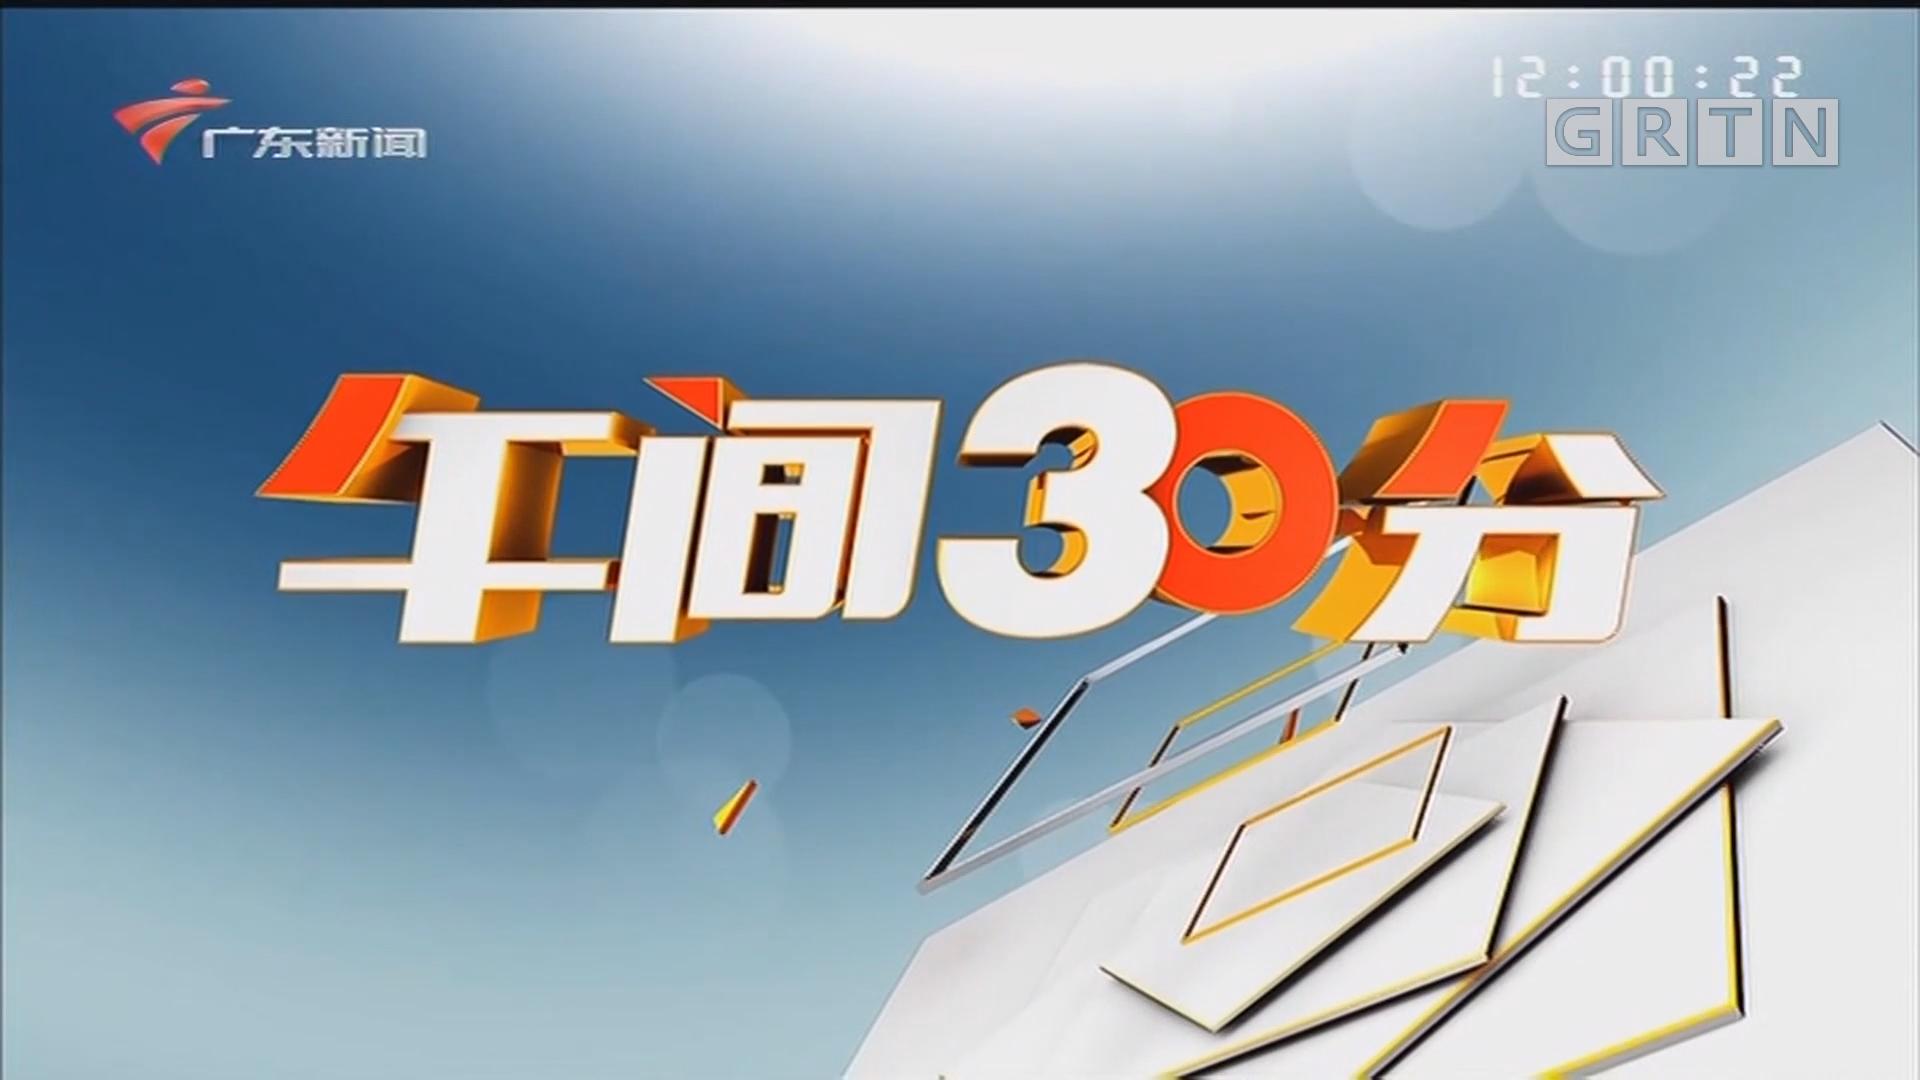 [HD][2020-02-24]午间30分:广东重大突发公共卫生事件一级响应调整为二级响应